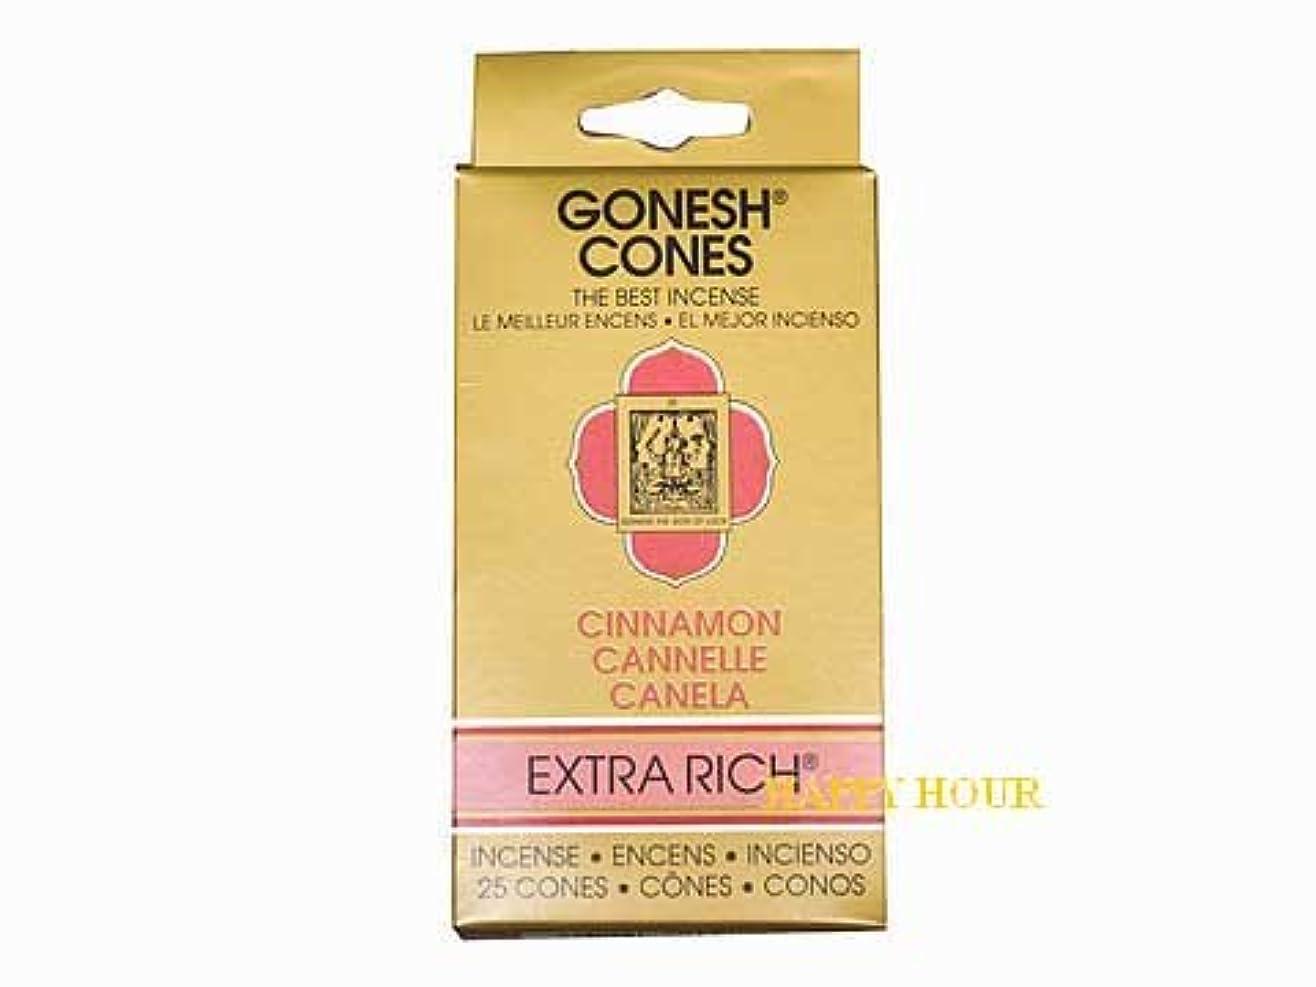 GONESH インセンス エクストラリッチコーンタイプ CINNAMON(シナモン香)